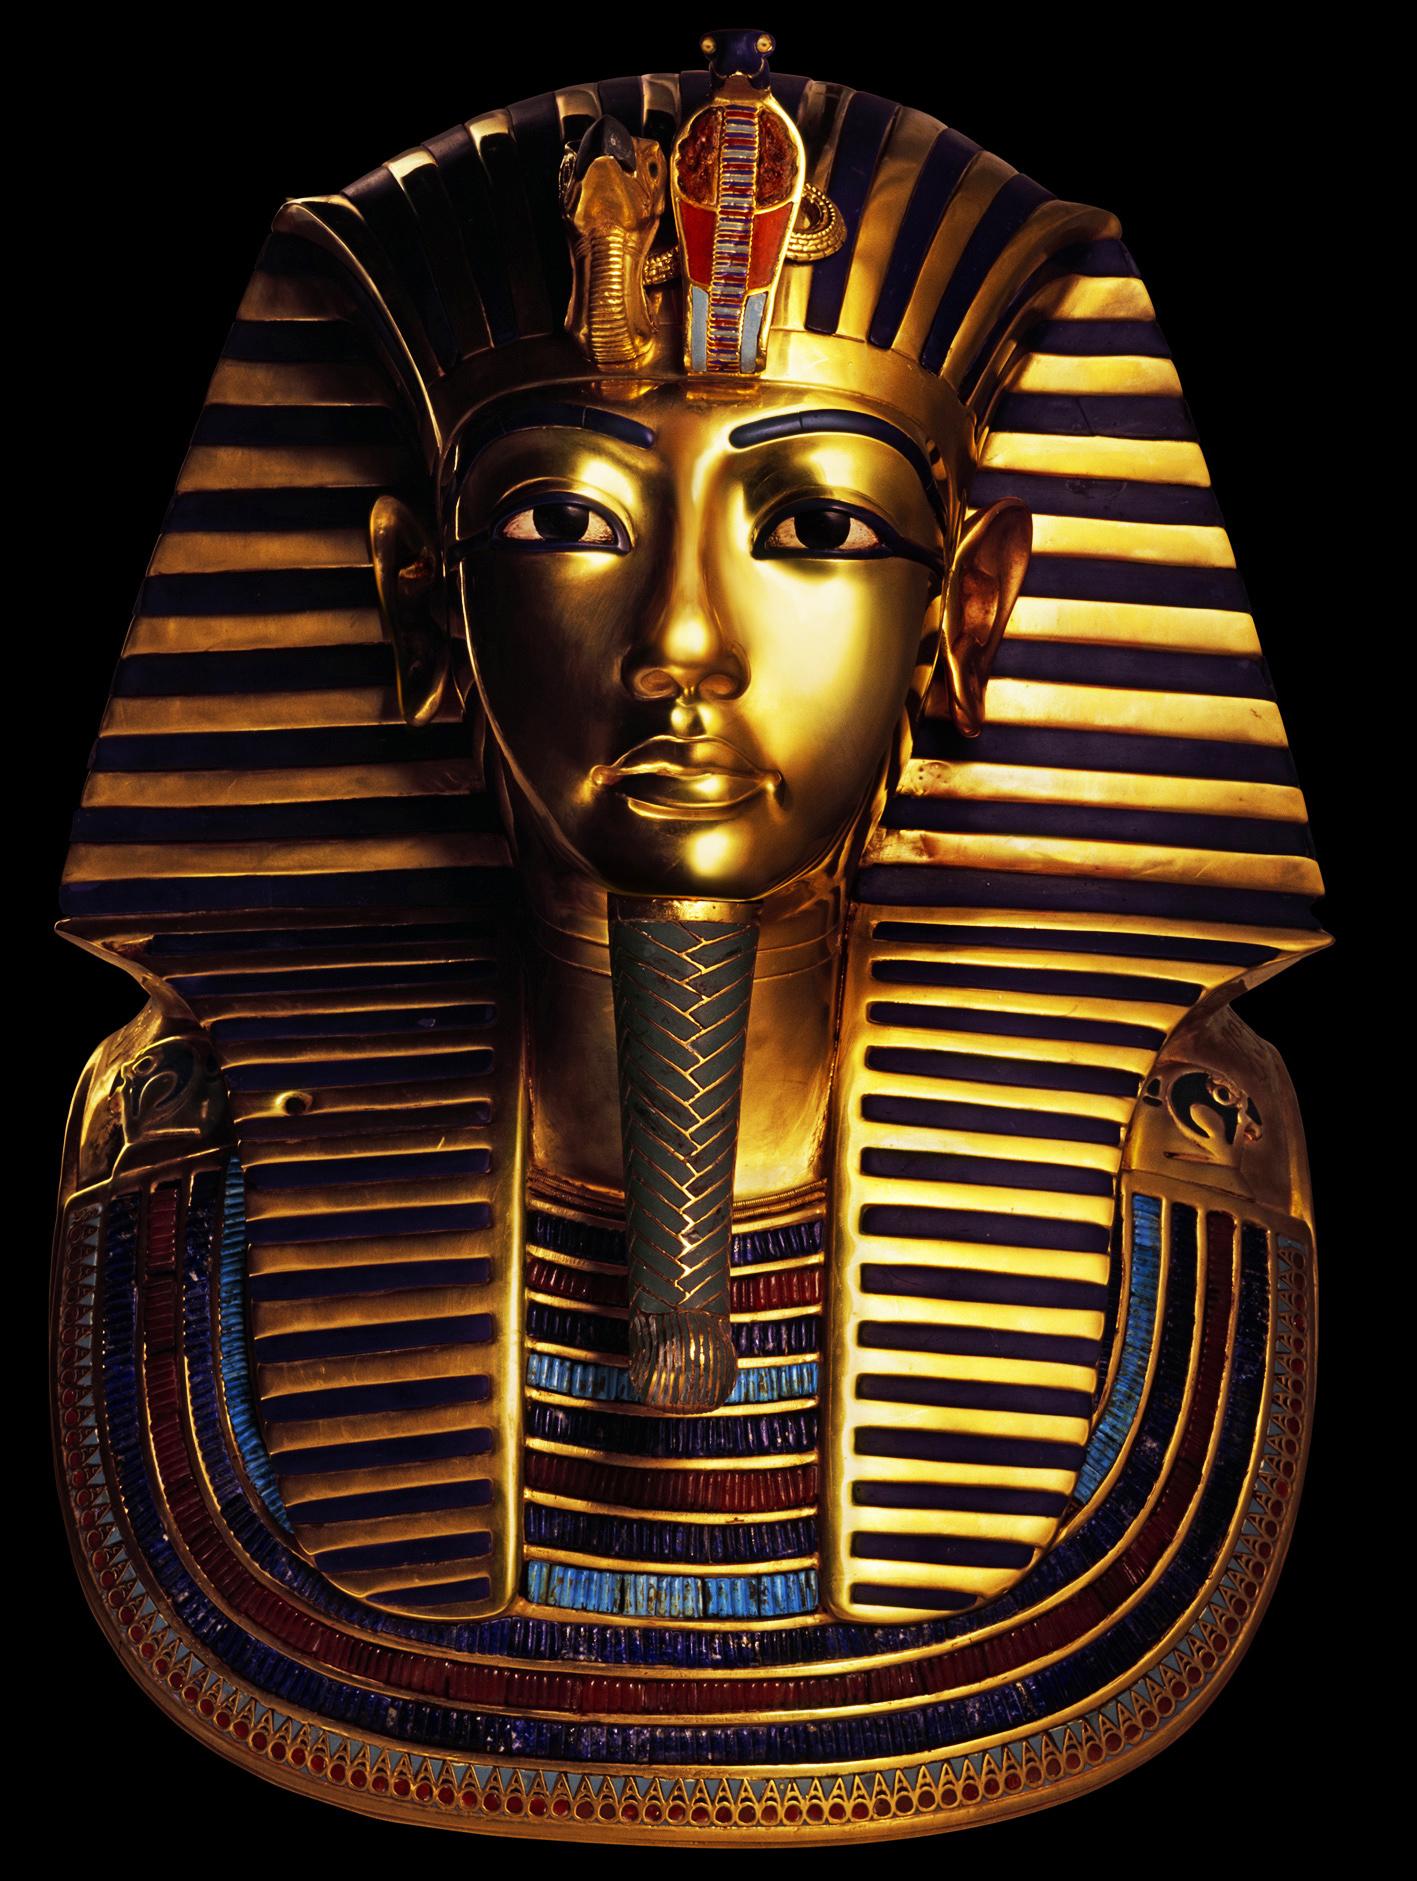 Tutankhamun's gold mask back on display in Egypt after beard restoration